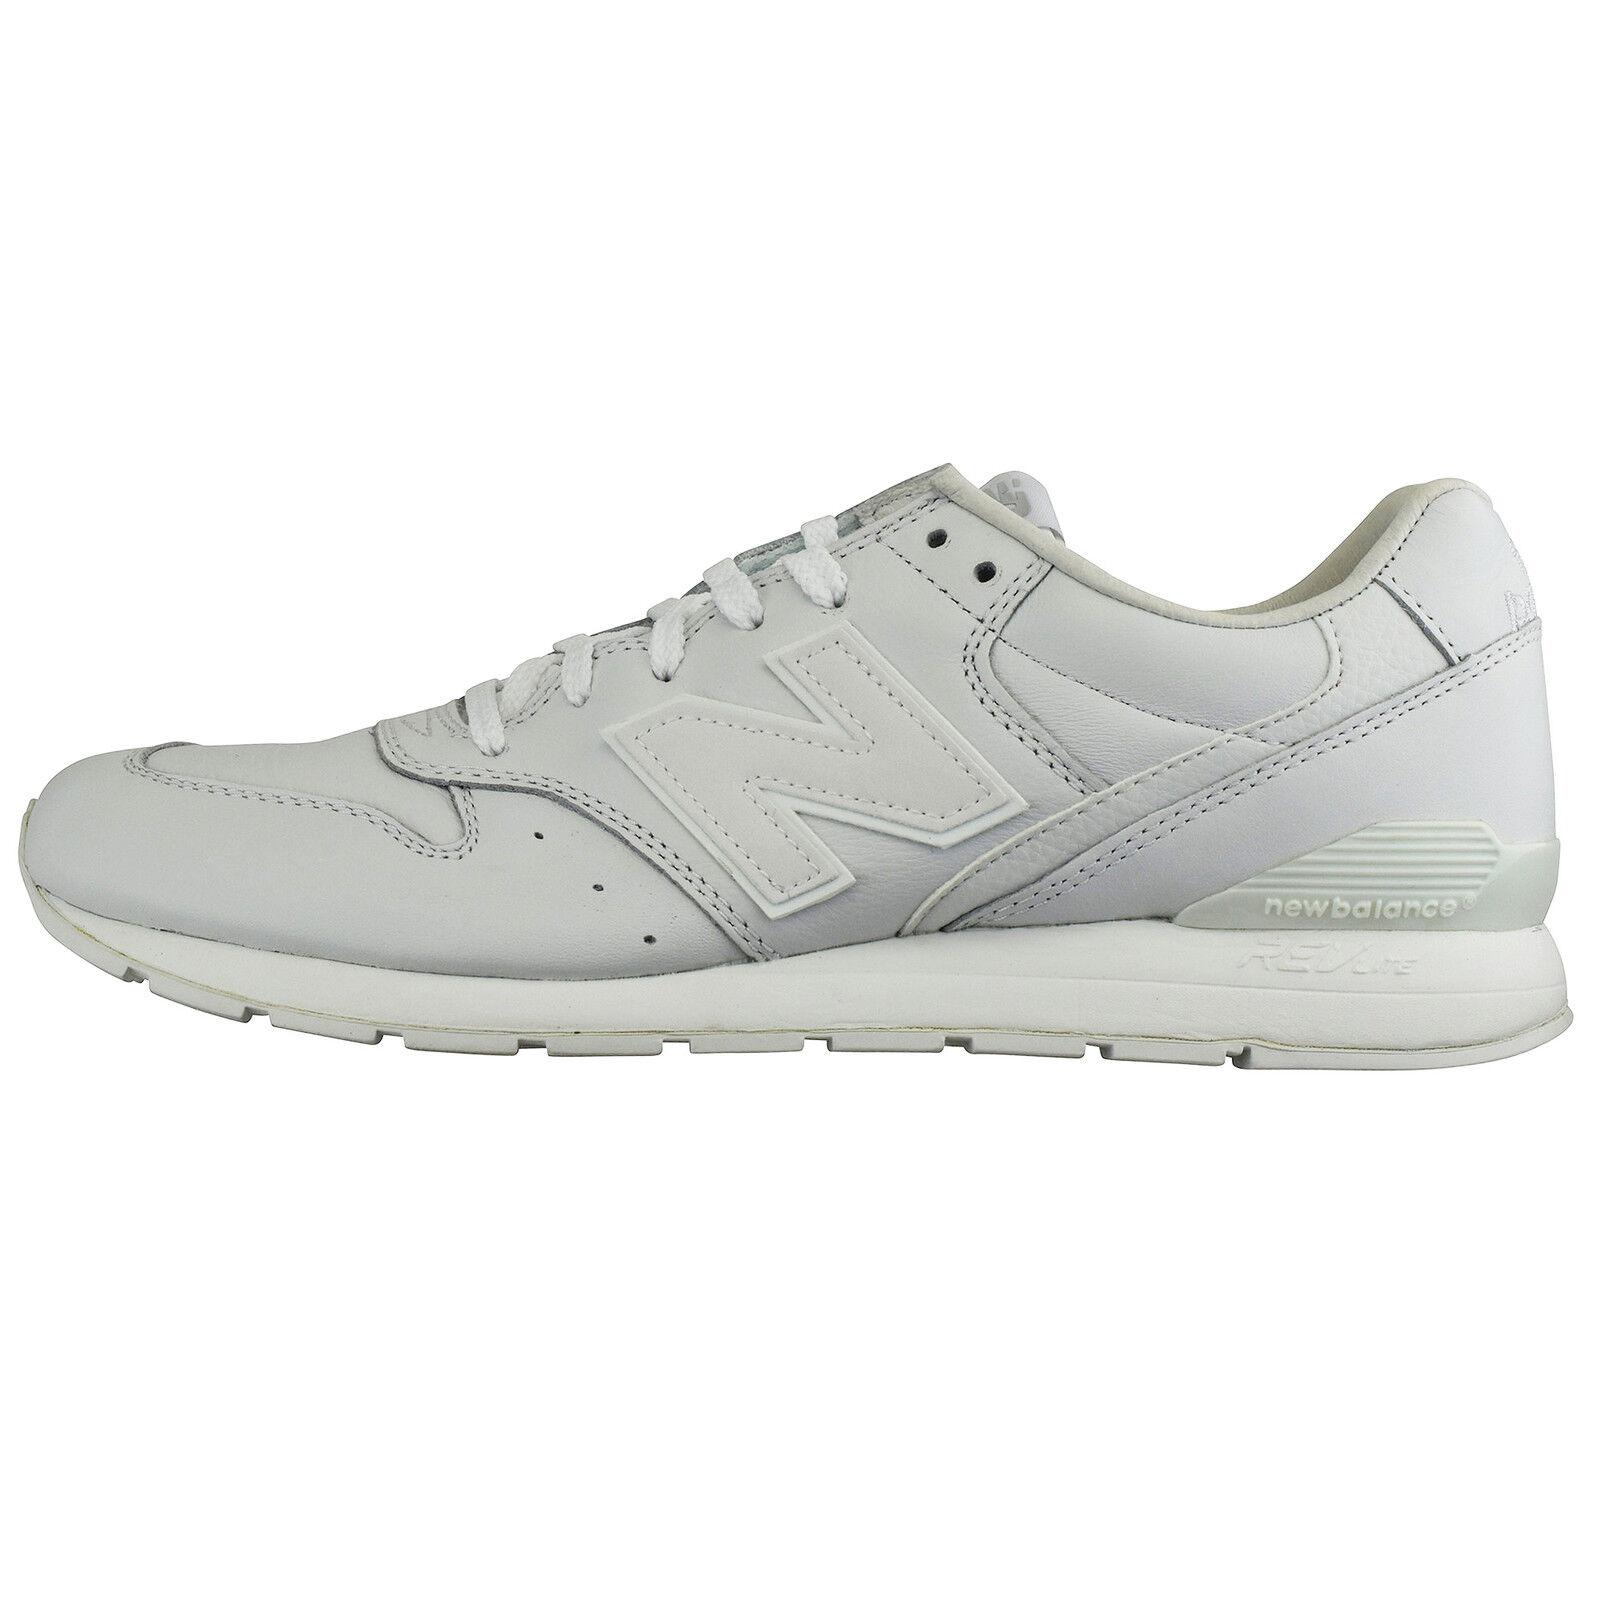 New Balance mrl996ew Lifestyle zapatillas ocio zapatillas de corriendo de ocio zapatillas 22e38e